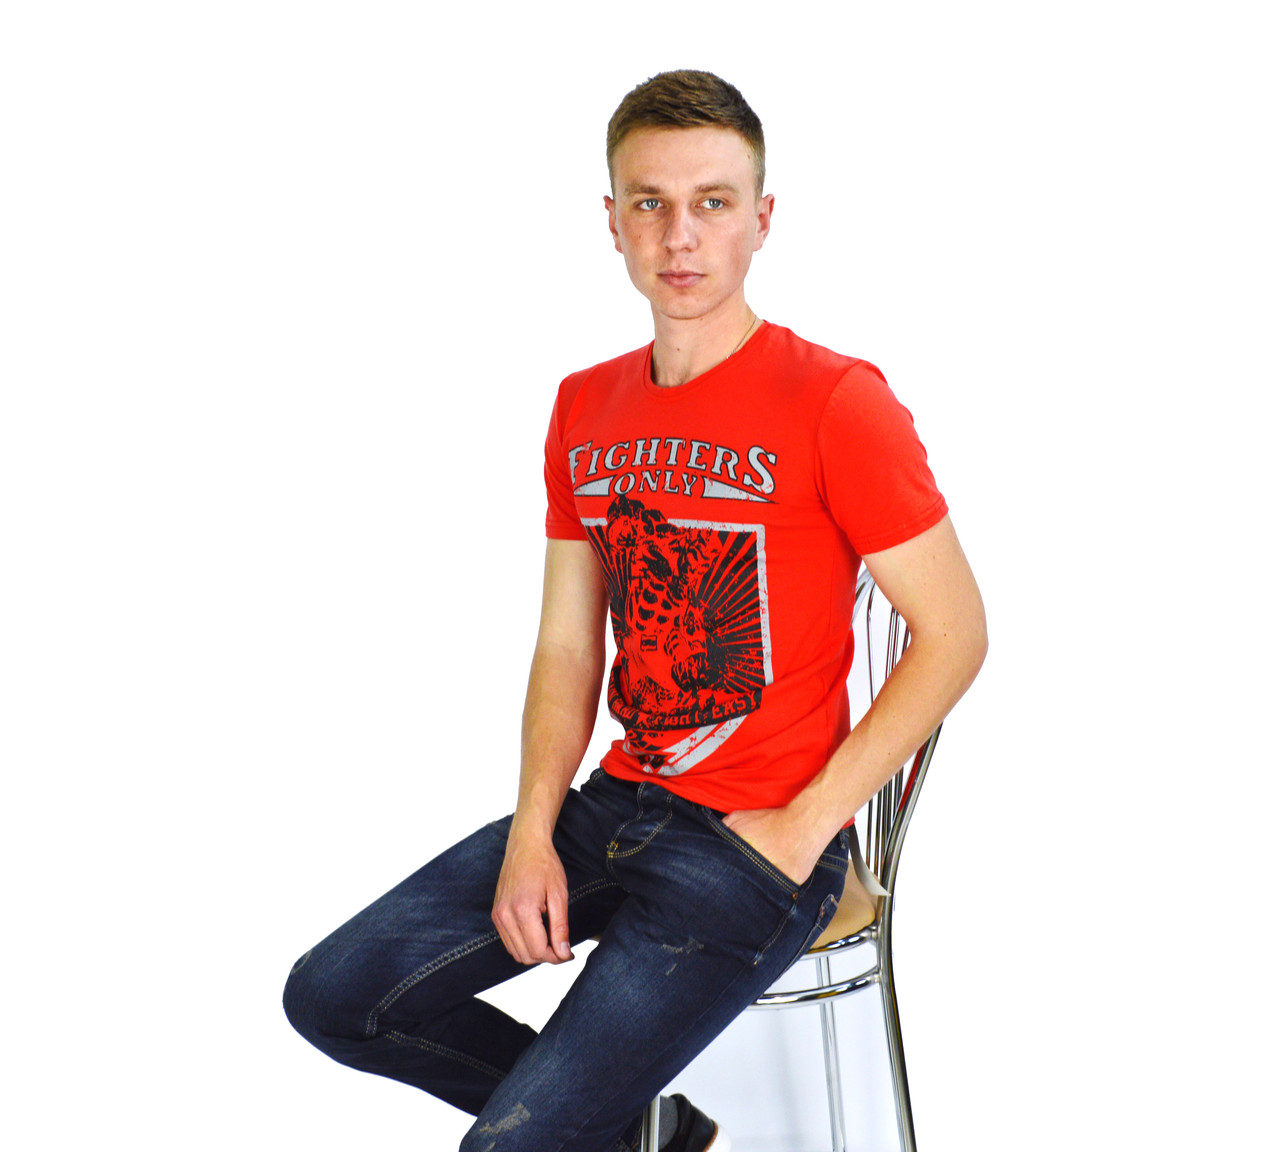 Тарракотовая мужская футболка с рисунком Fighters на лето